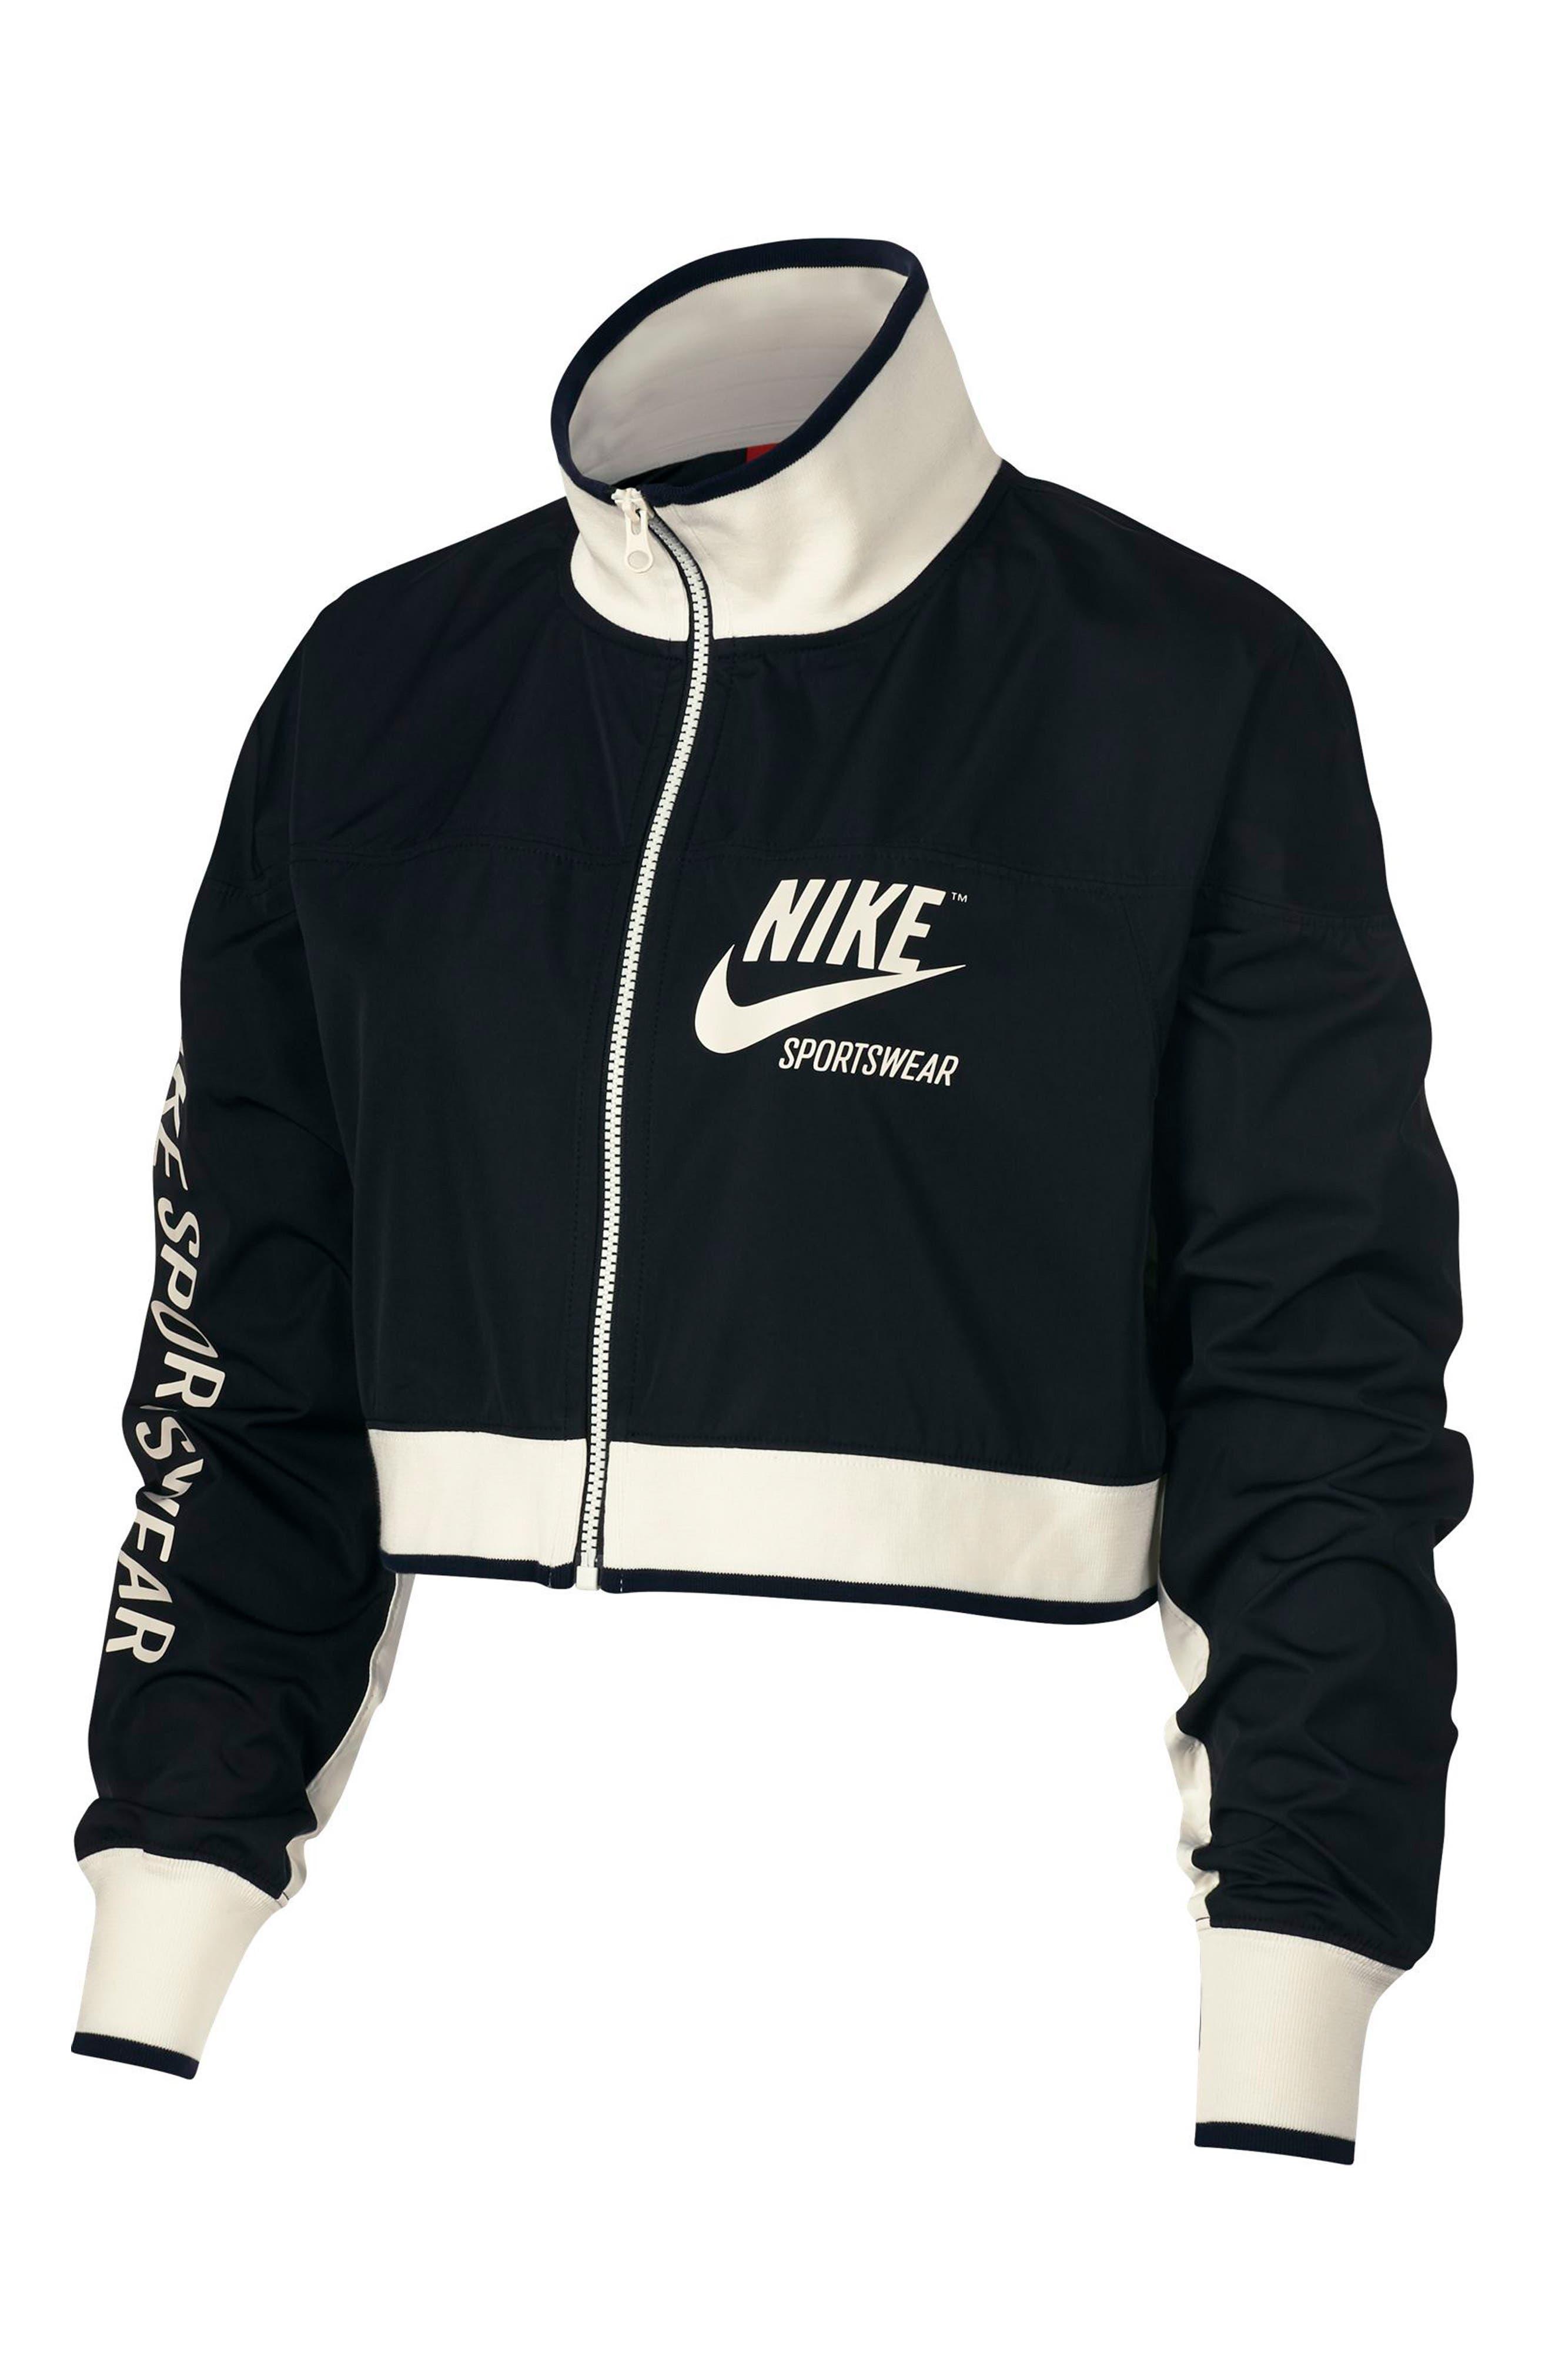 Sportswear Archive Women's Track Jacket,                         Main,                         color, Black/ Black/ Sail/ Sail